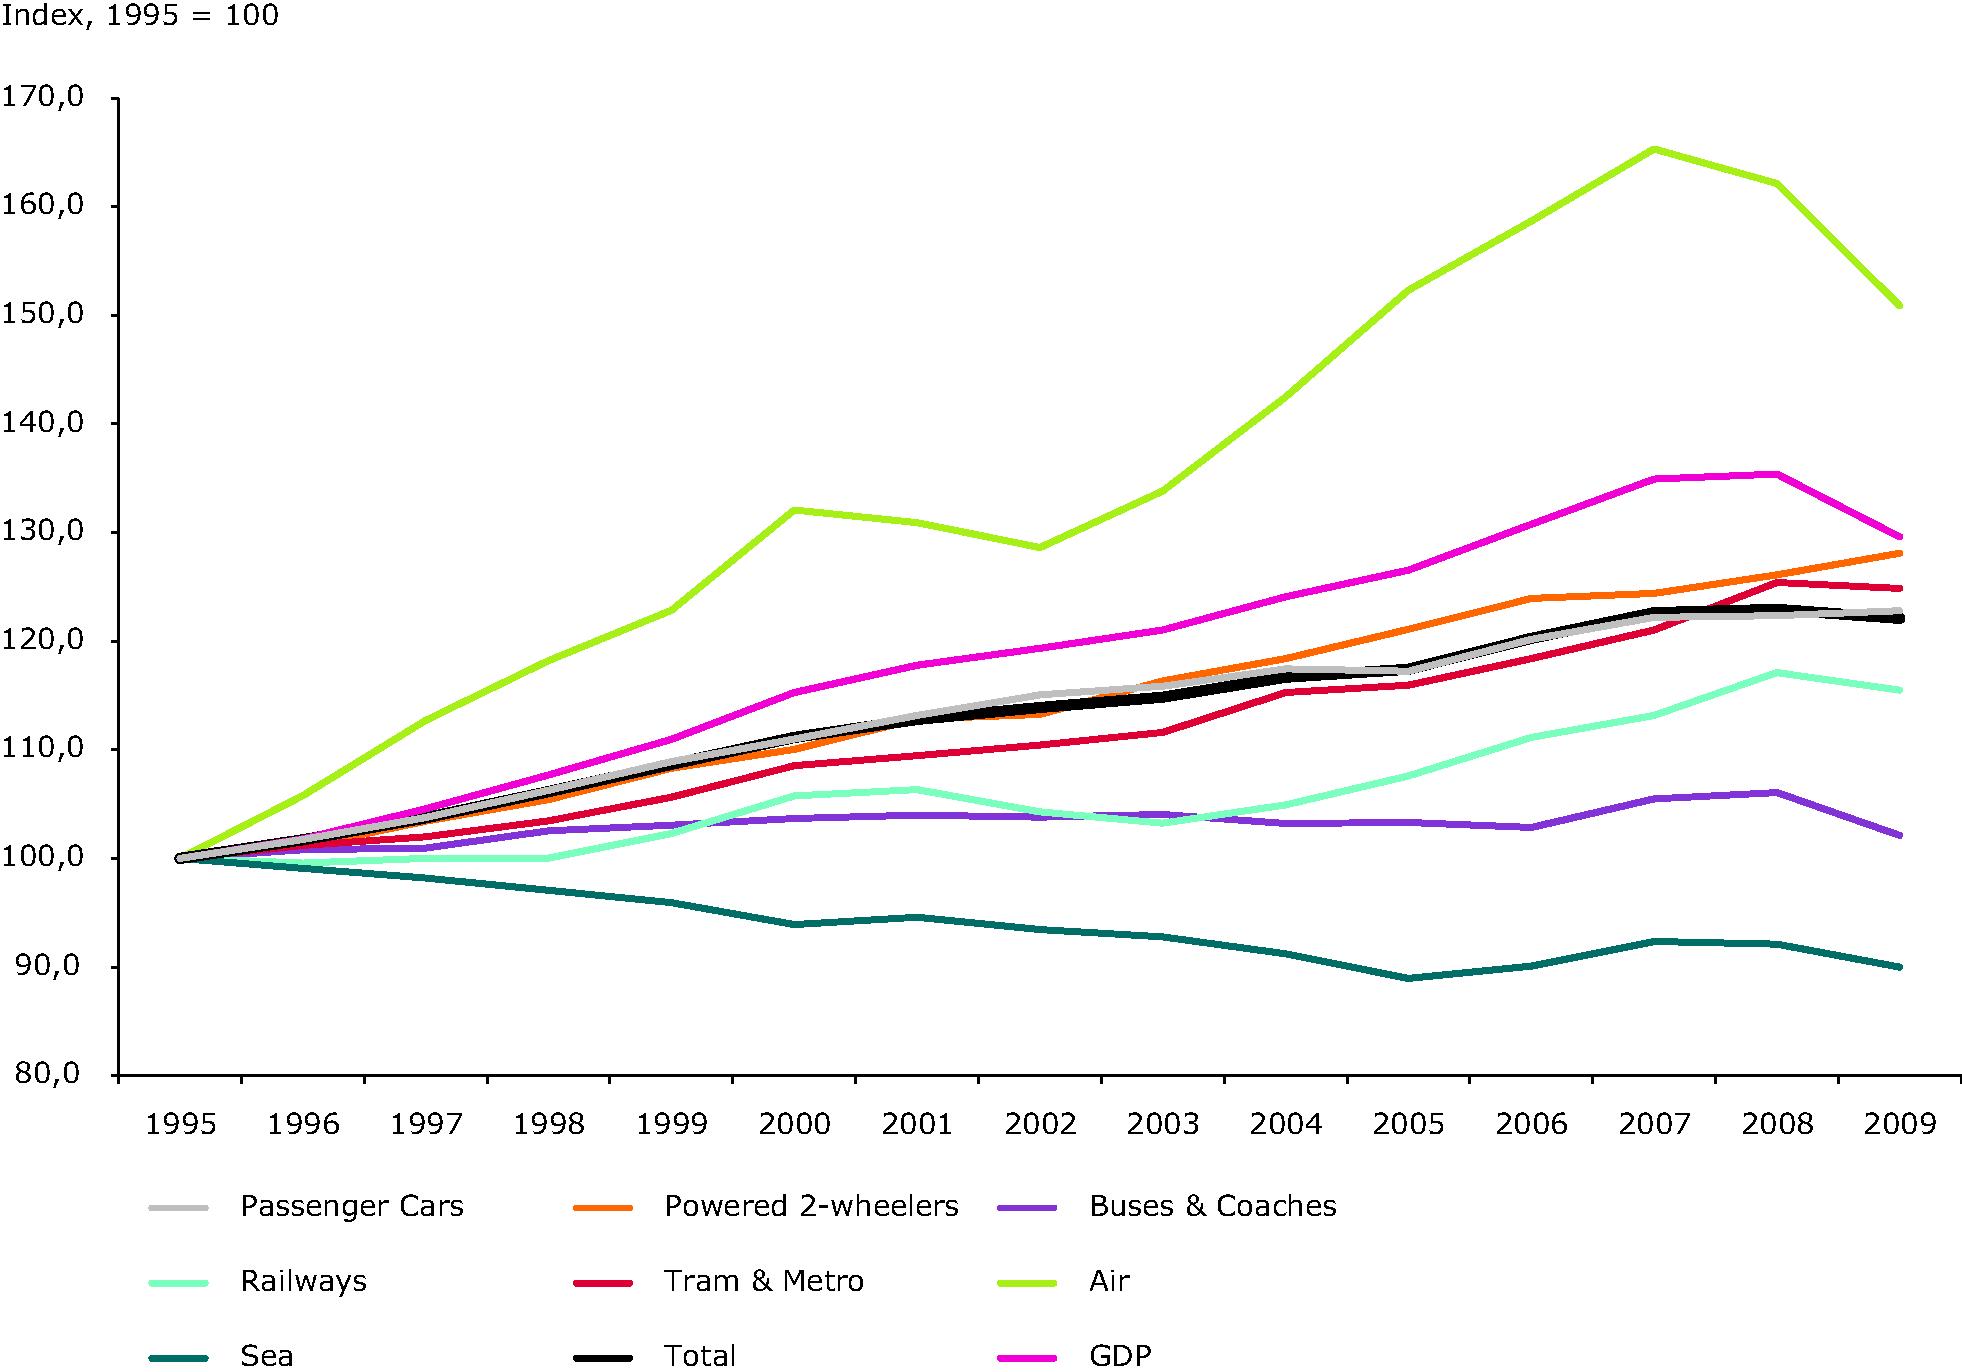 Trends in passenger transport demand by mode alongside developments in GDP